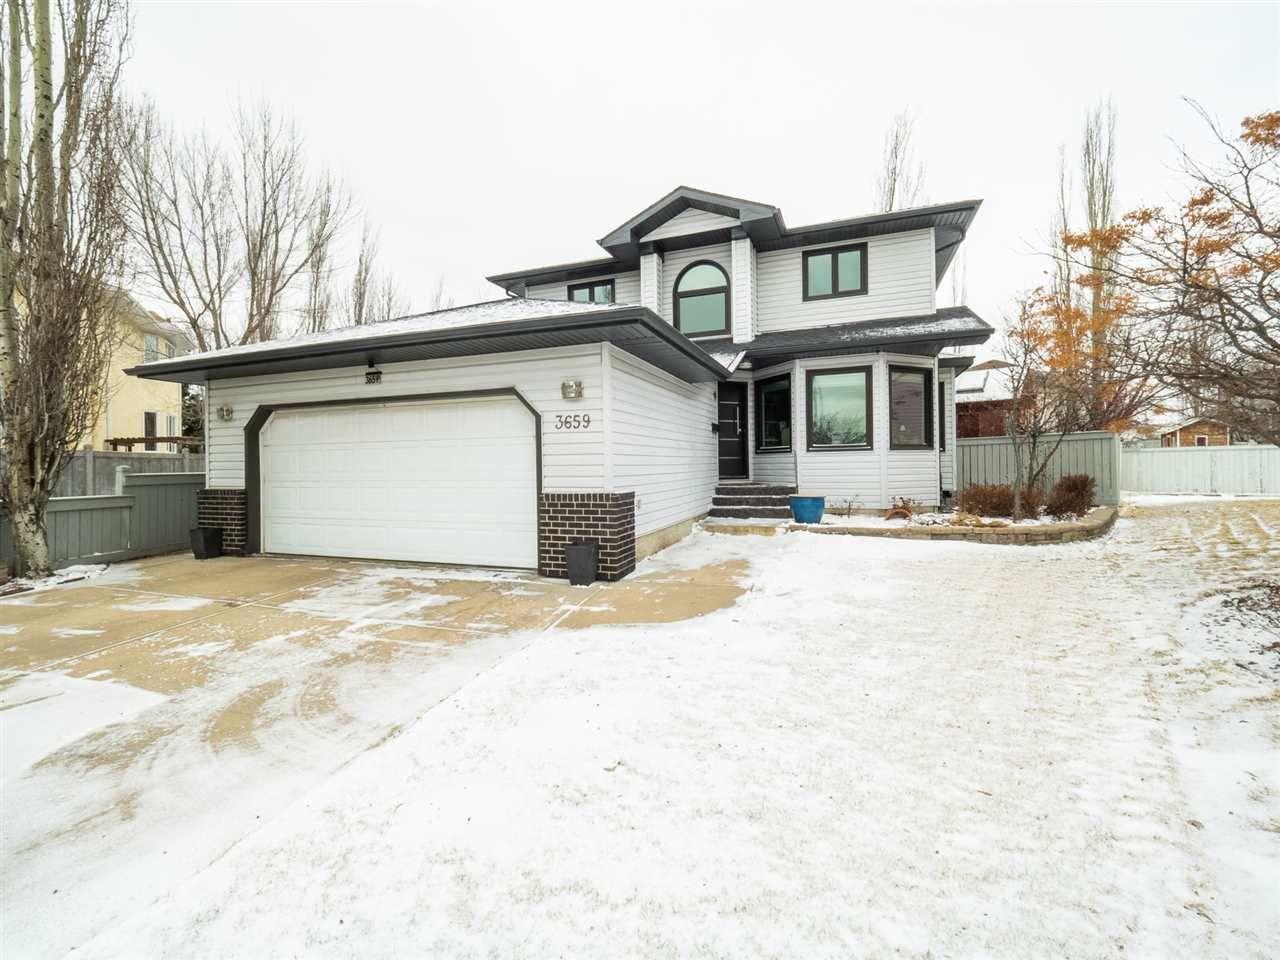 Main Photo: 3659 30 Street in Edmonton: Zone 30 House for sale : MLS®# E4236183